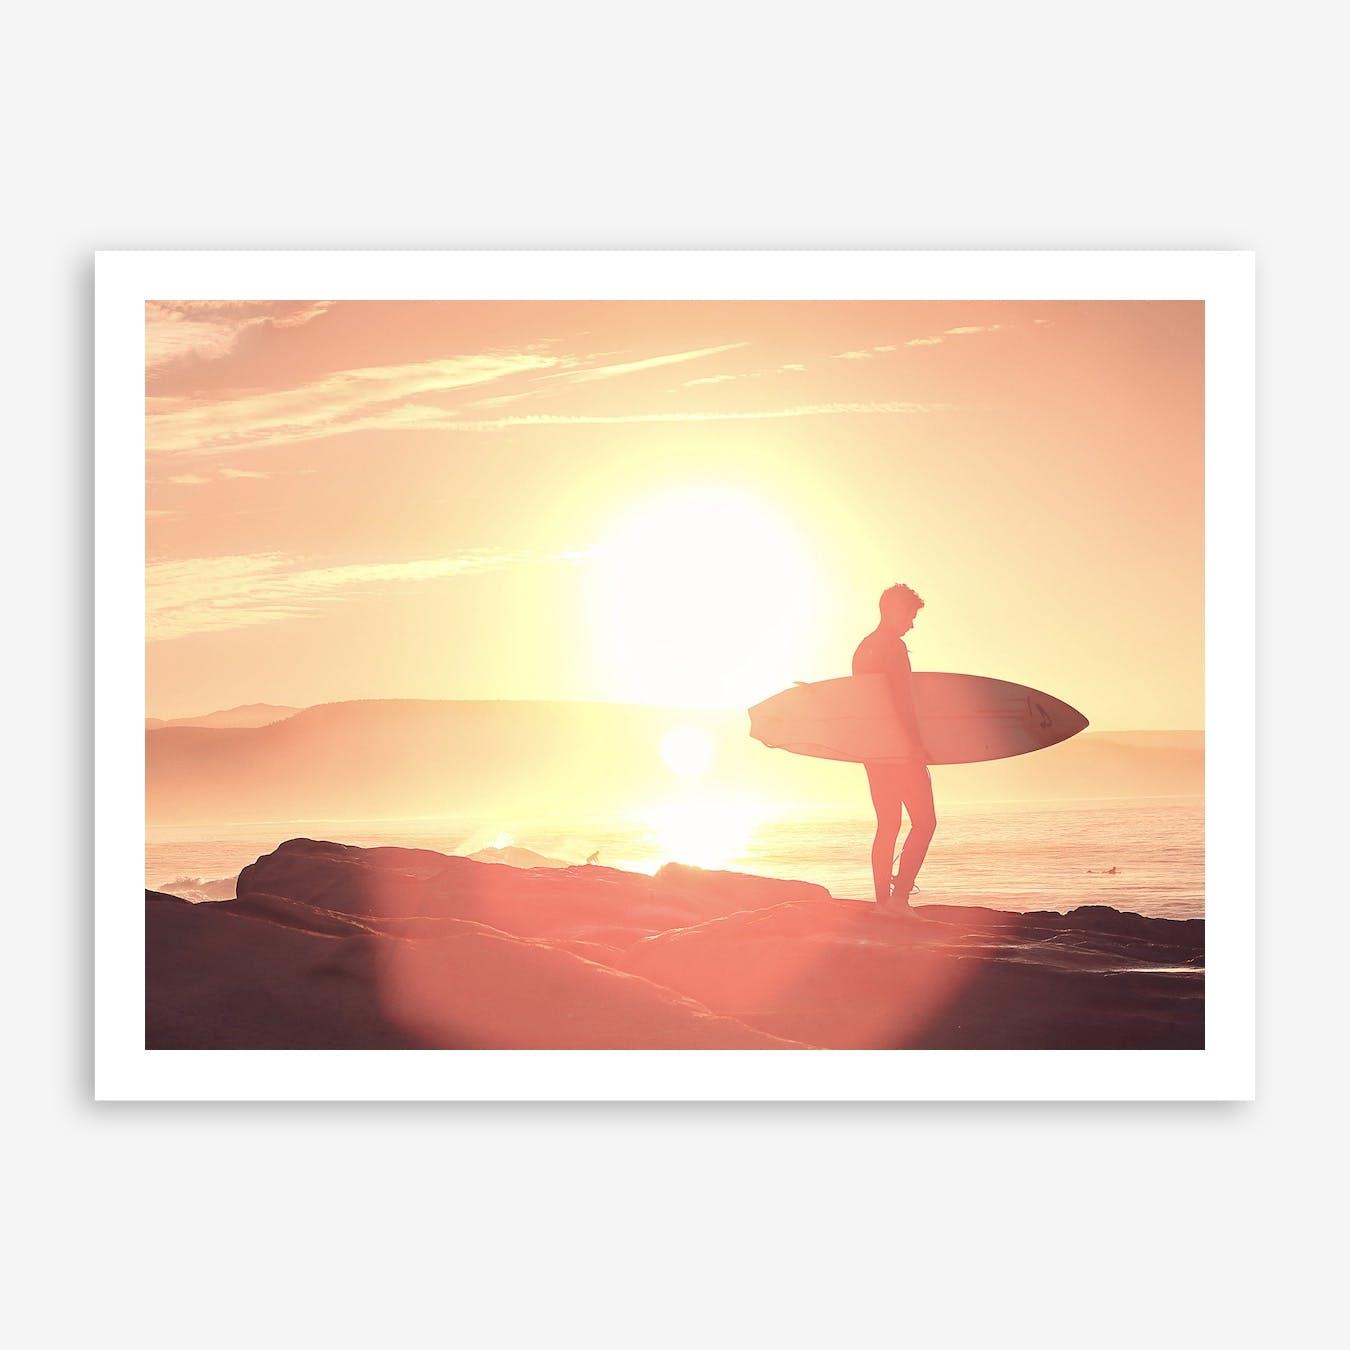 Sunrise Surf x Morocco